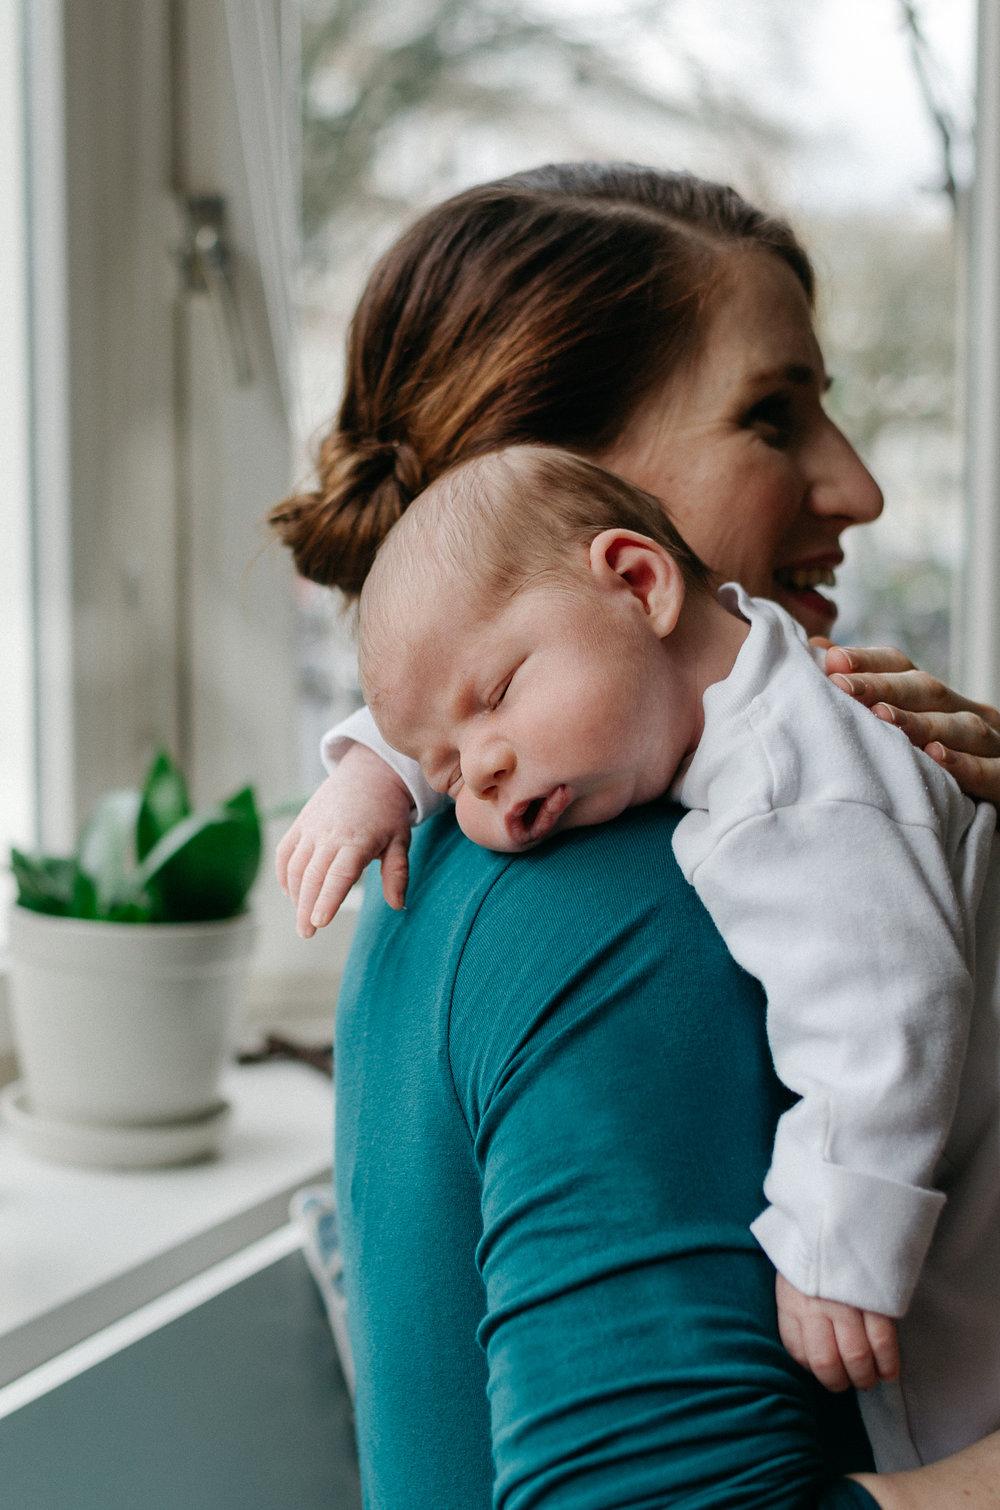 Vicky_McLachlan_Photography_Family_Newborn_Lifestyle_Photographer-6.jpg